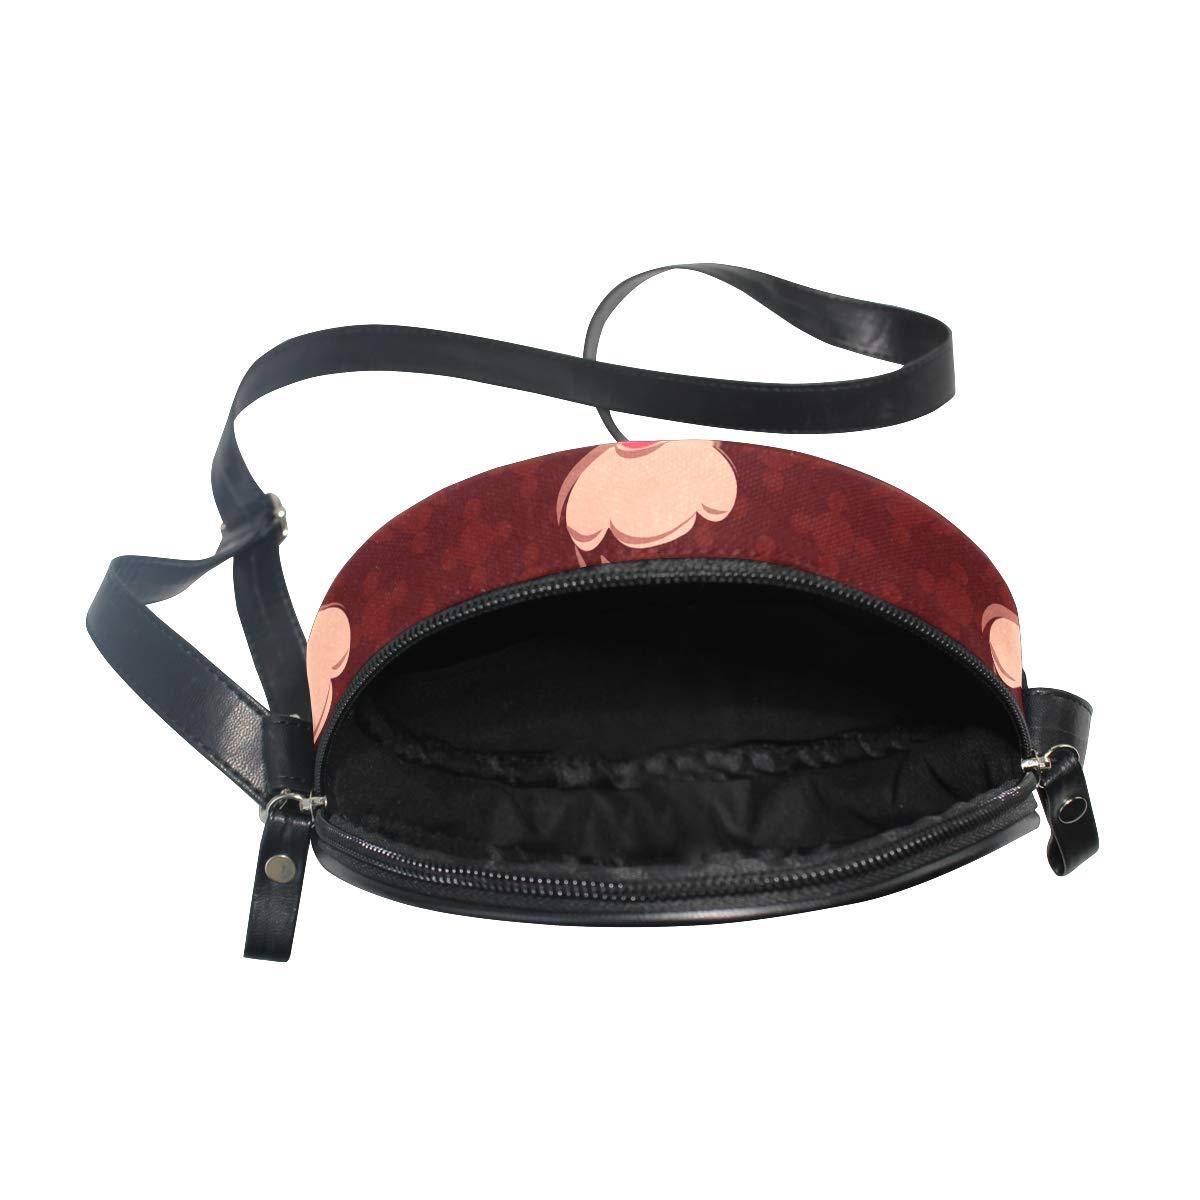 KEAKIA Cherry Cupcakes Round Crossbody Bag Shoulder Sling Bag Handbag Purse Satchel Shoulder Bag for Kids Women